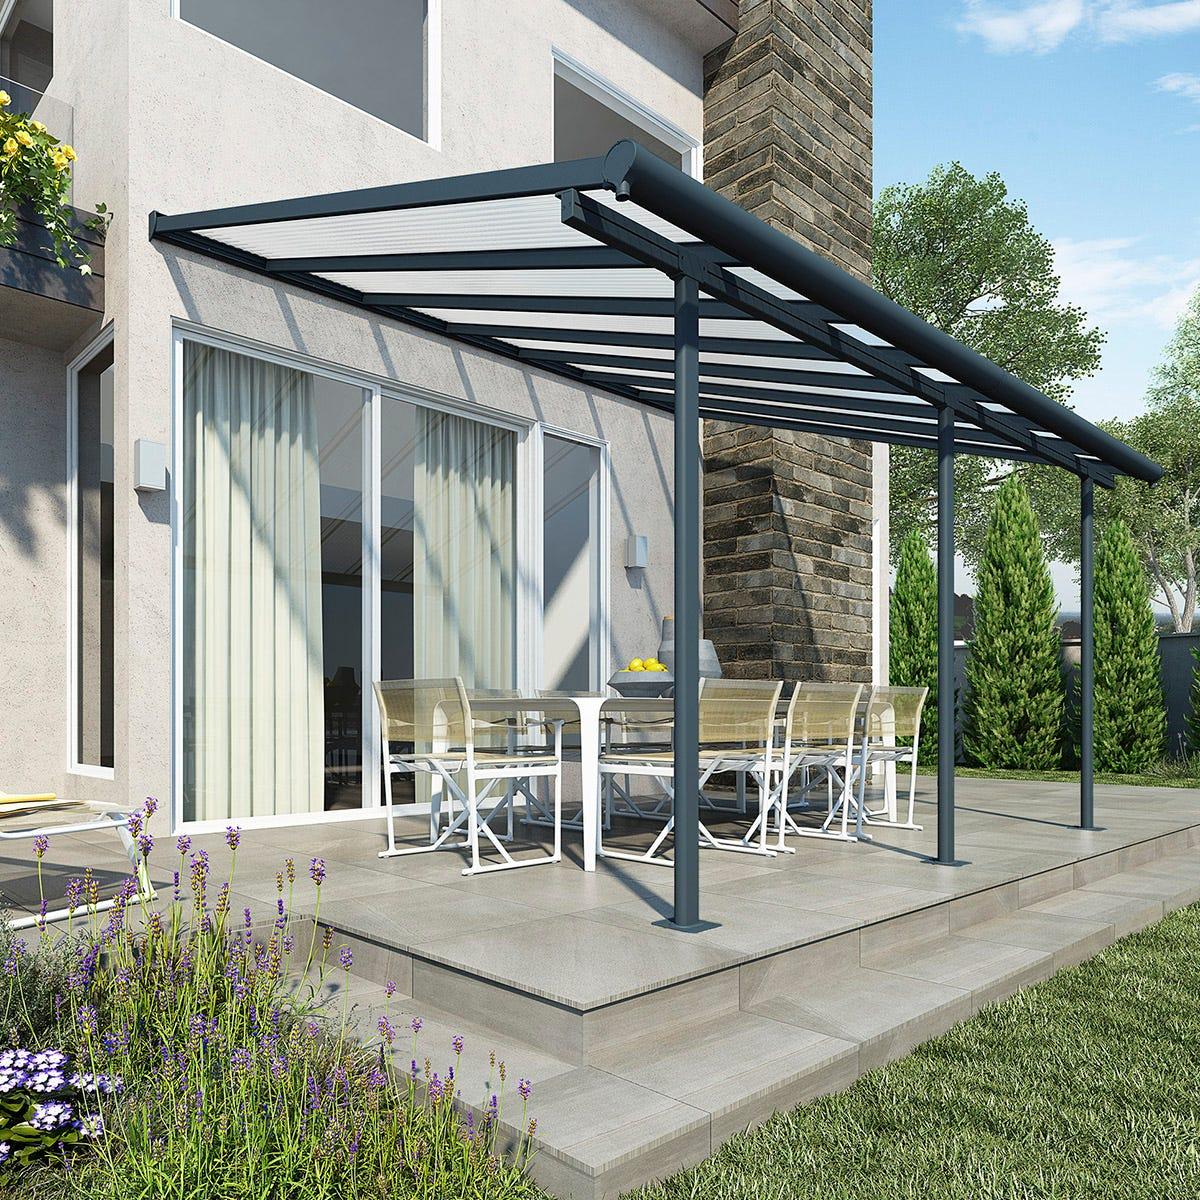 Palram - Canopia Sierra Patio Cover 3m x 4.25m - Grey Clear